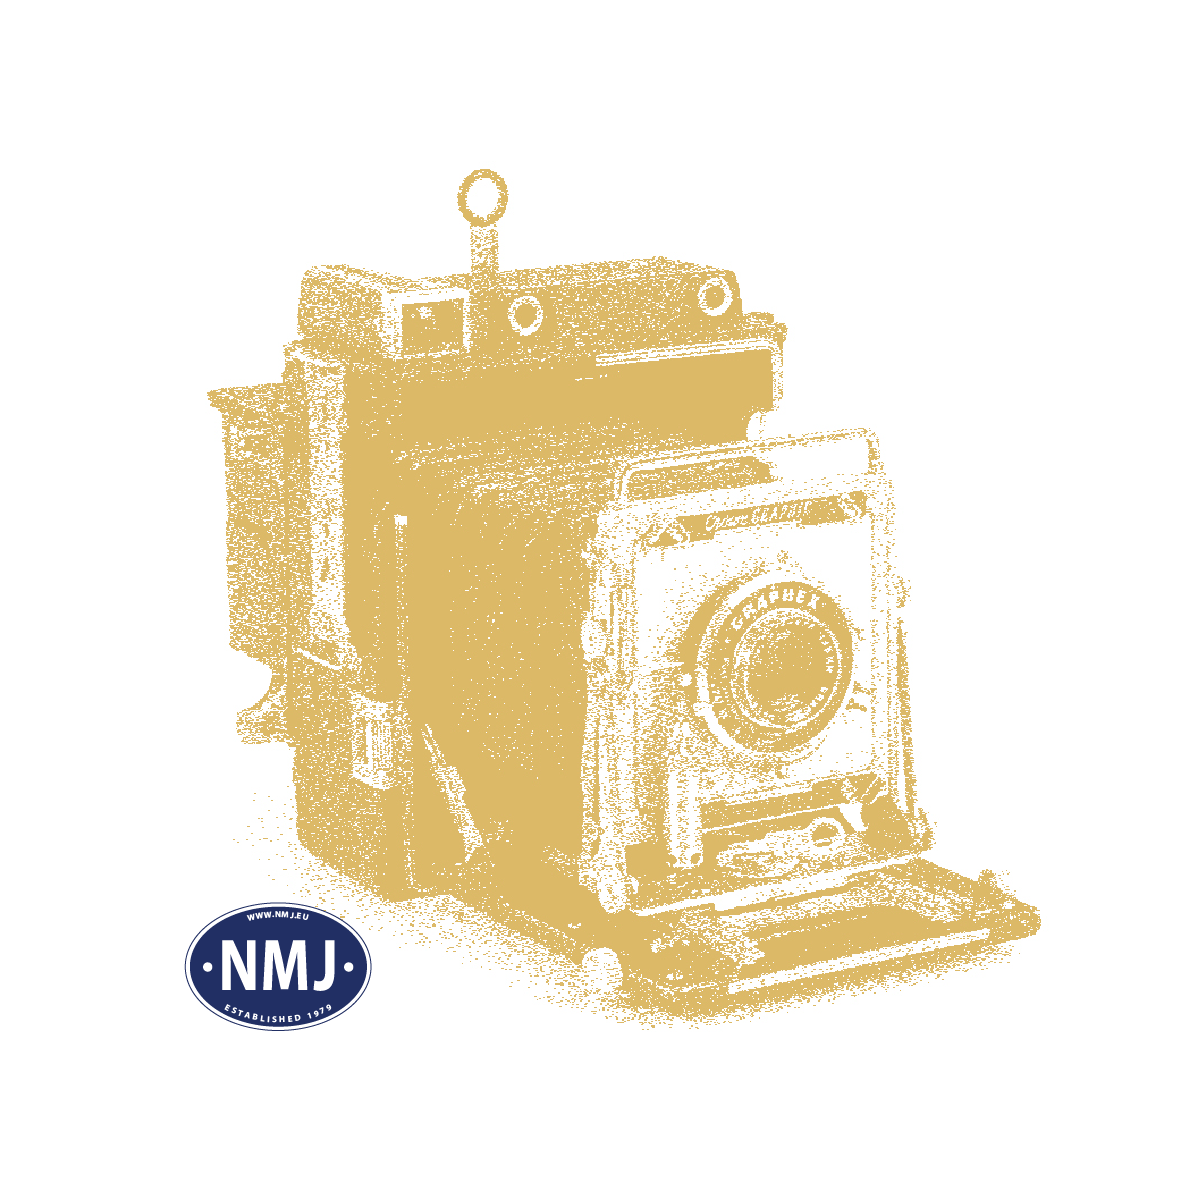 NOC75116 - Assorterte figurer, pose, H0